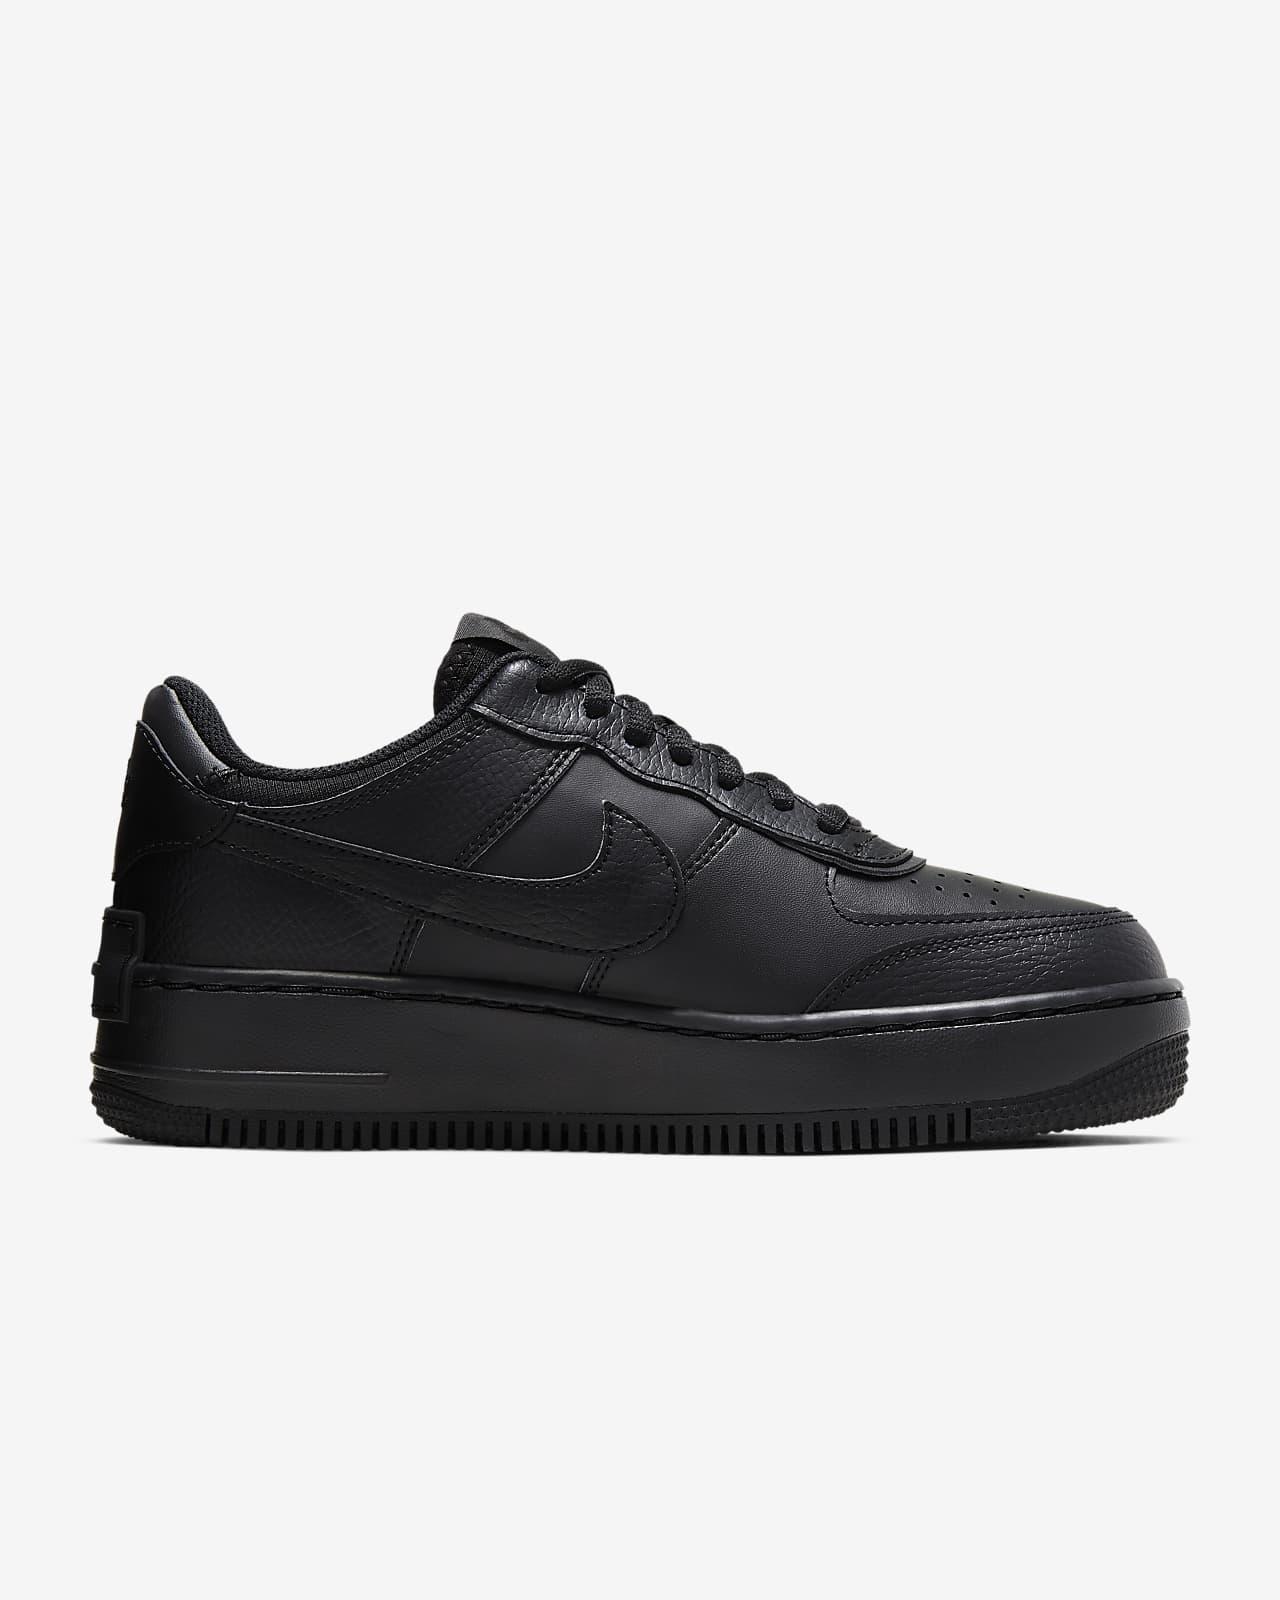 Nike Air Force 1 Shadow Women's Shoes. Nike CA